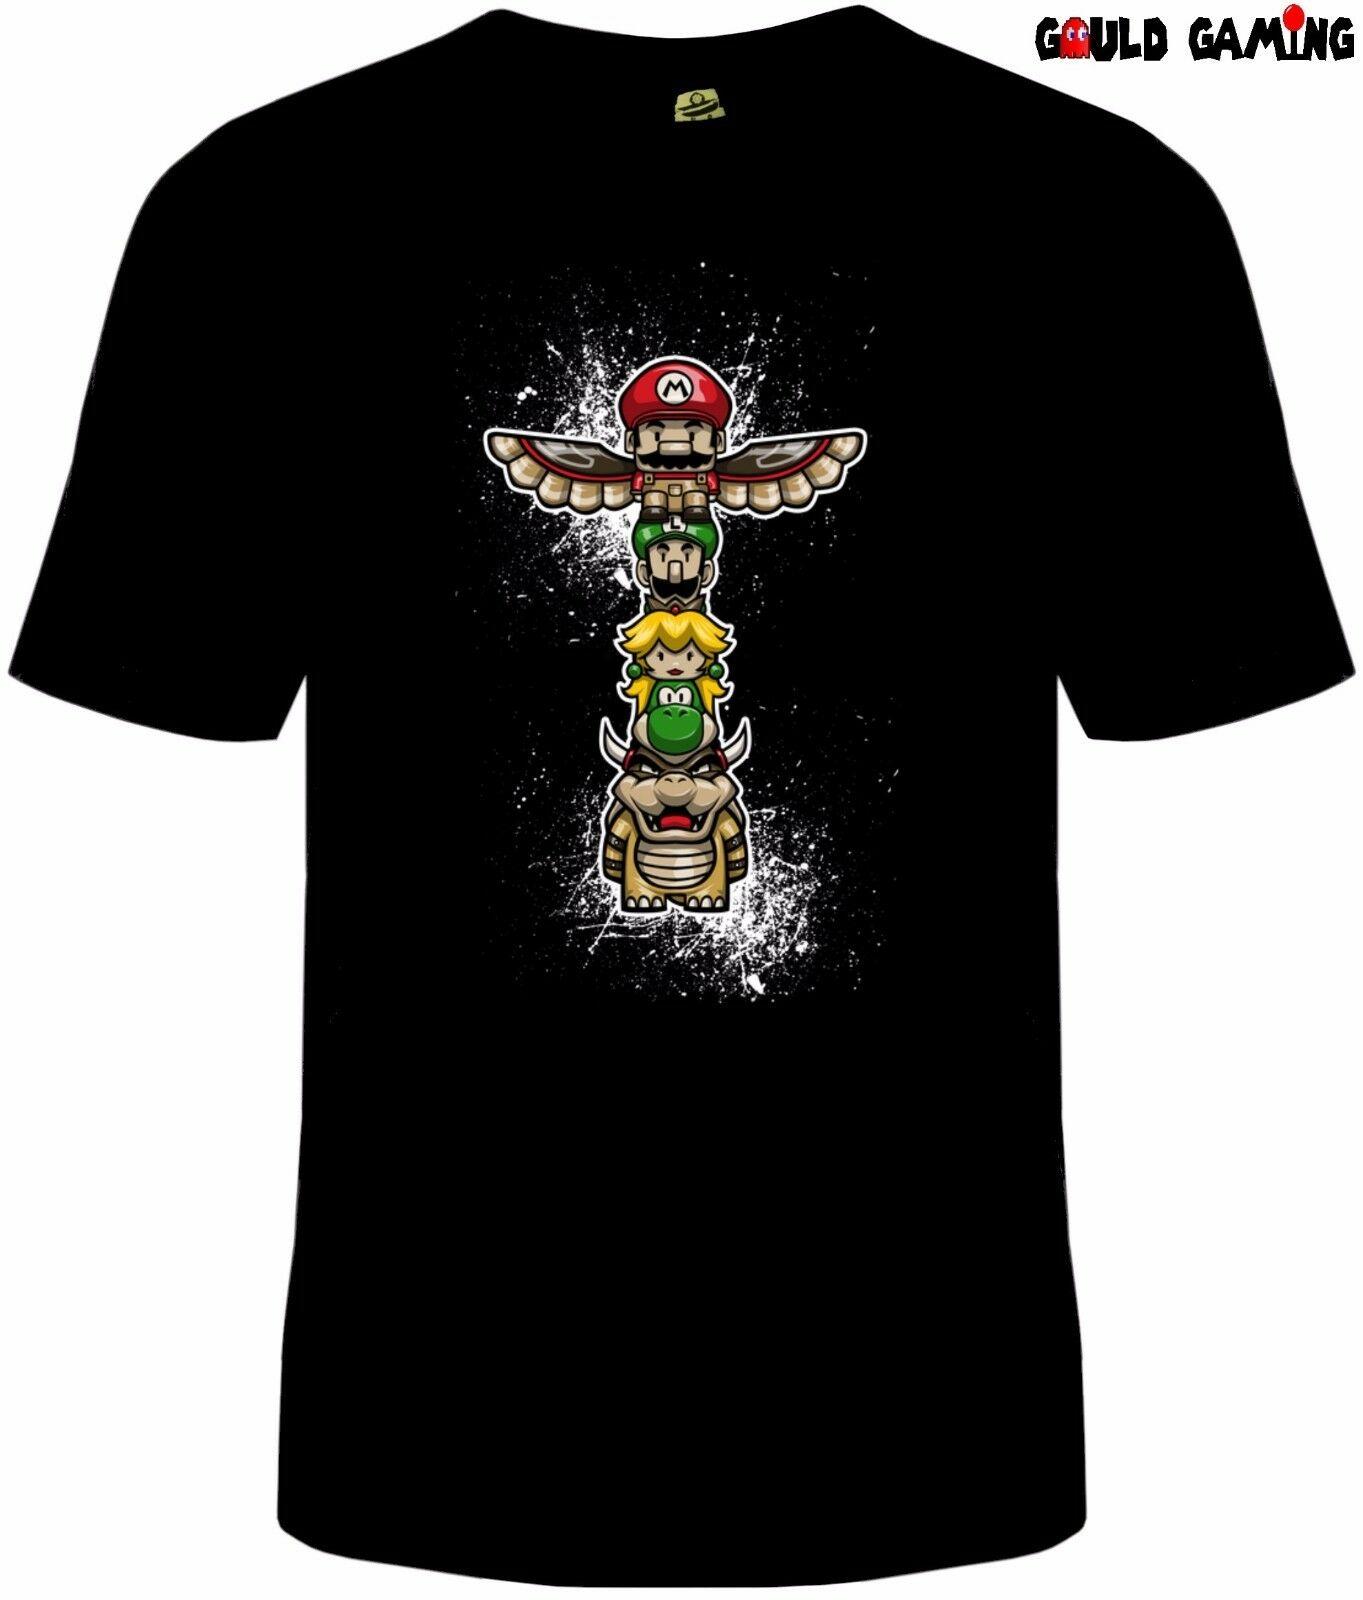 Super Mario Totem Polo camiseta Unisex adulto Bowser Peach Luigi Nintendo tamaño nuevo